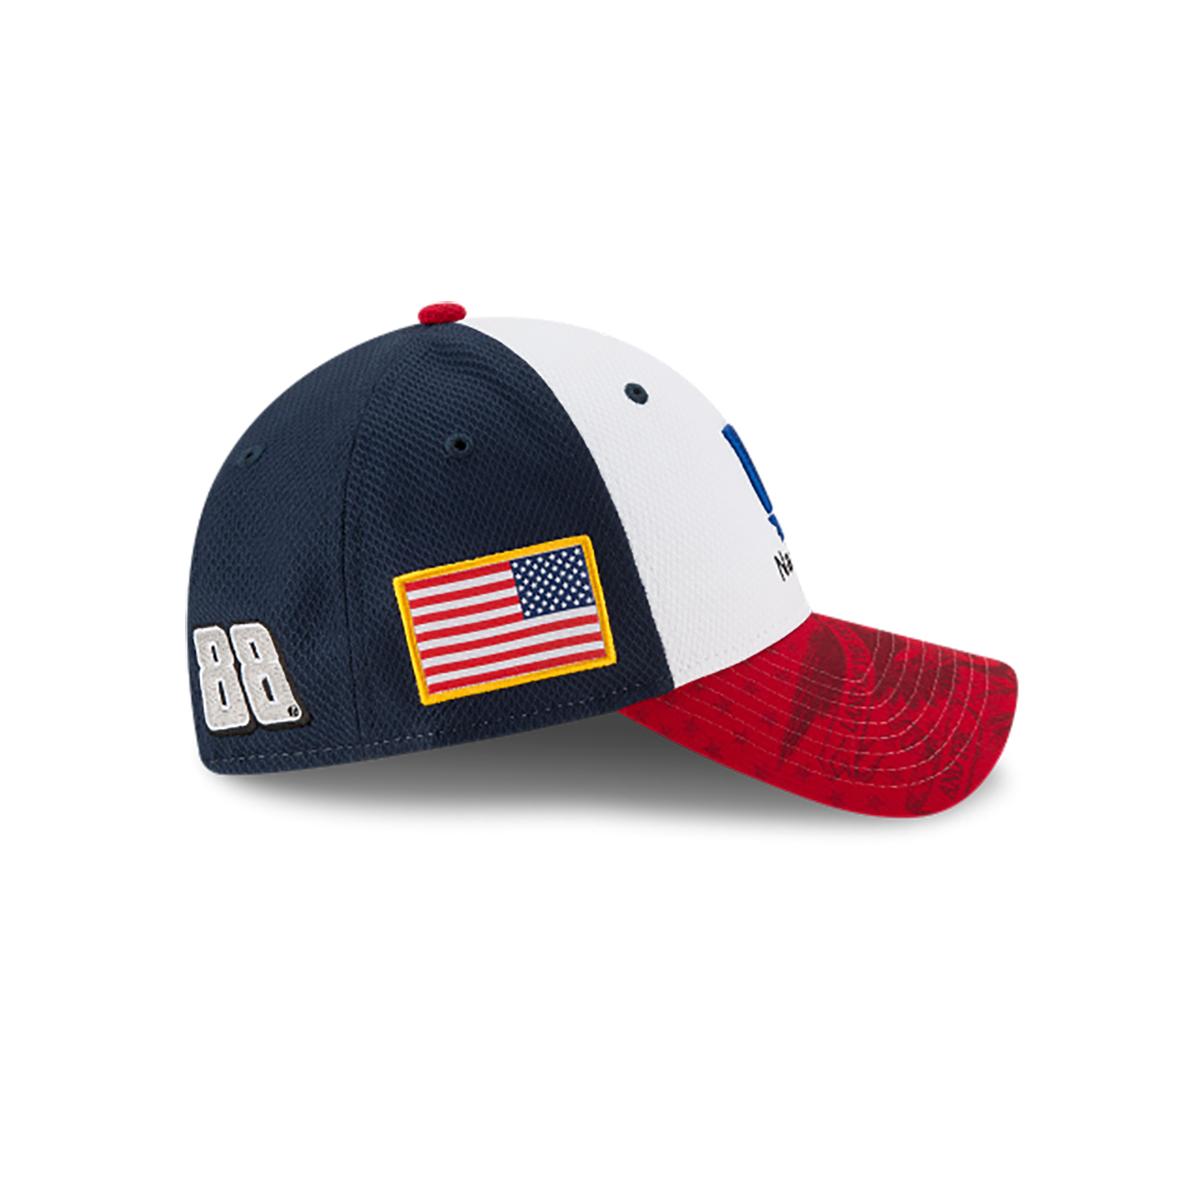 Dale Jr. #88 American Salute Nationwide New Era 9FORTY Cap